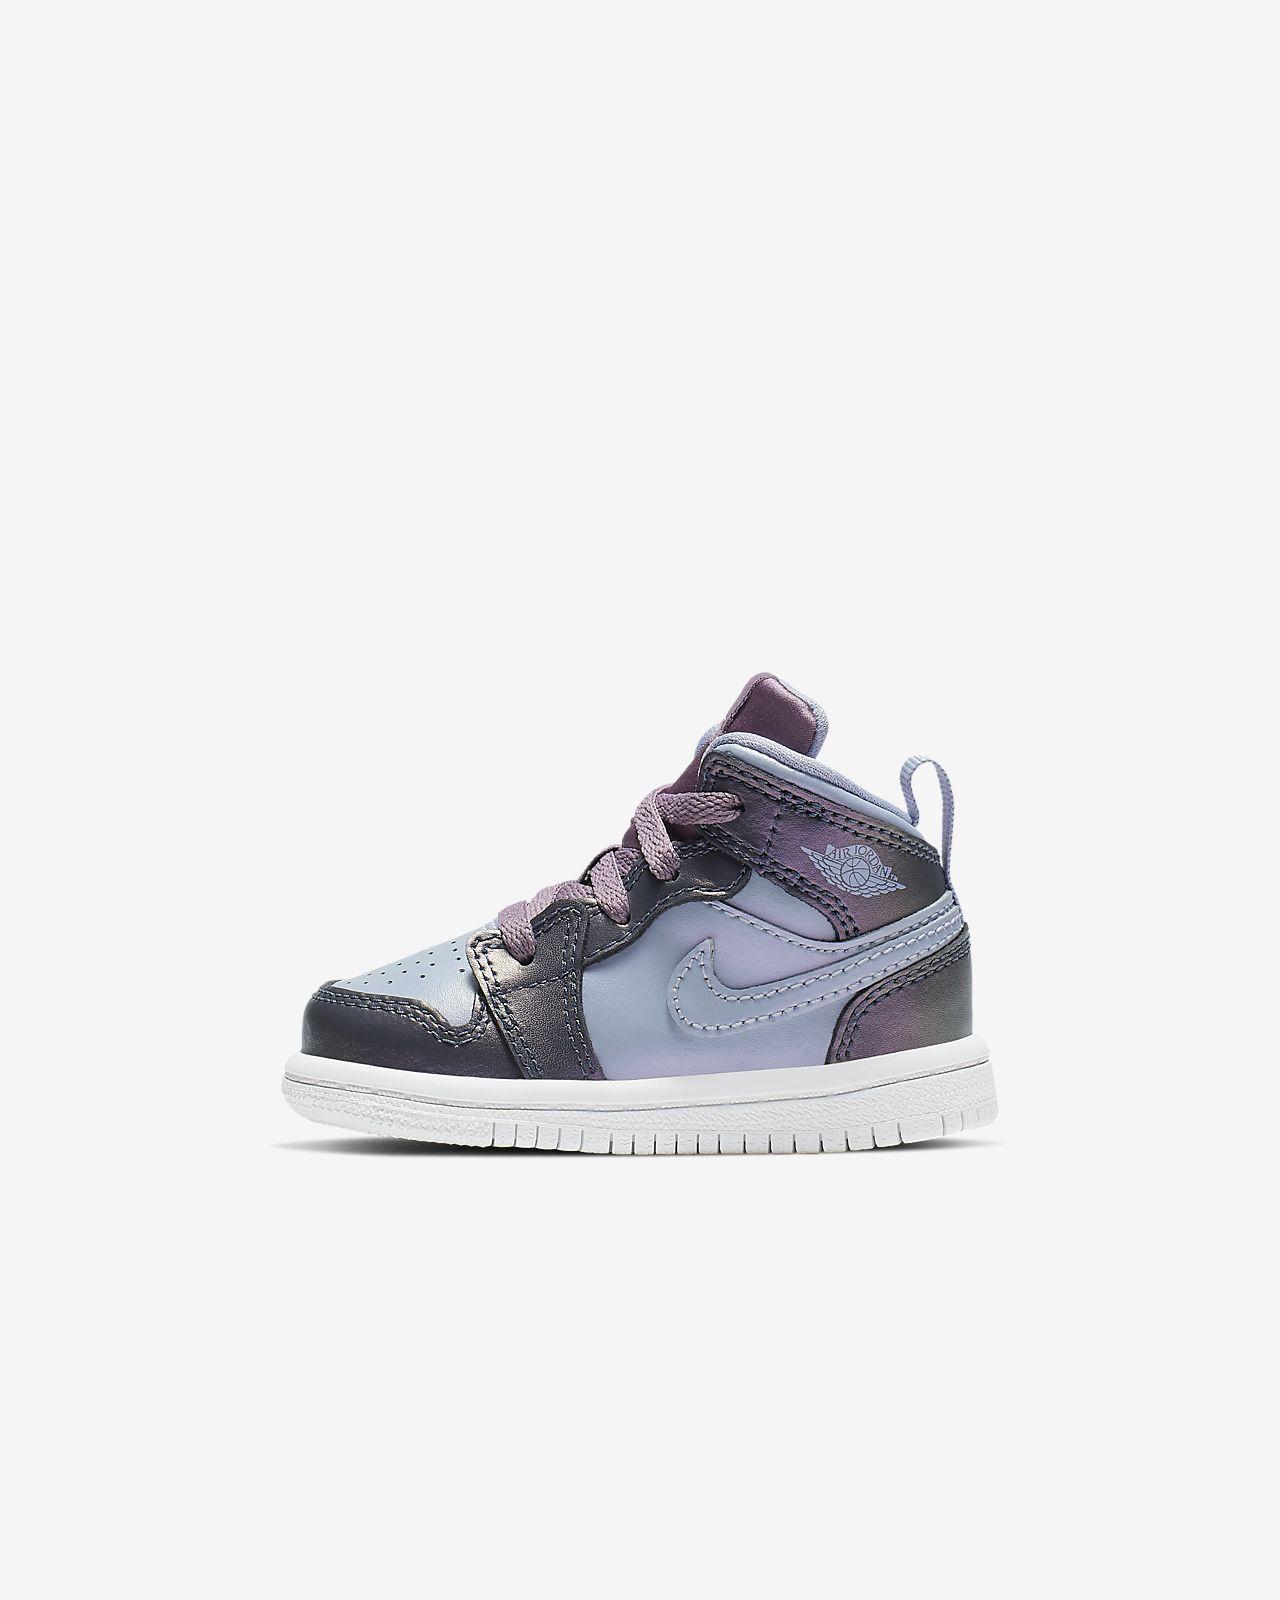 309cfac2cd3f0a Jordan 1 Mid SE Toddler Shoe (2c-10c). Nike.com